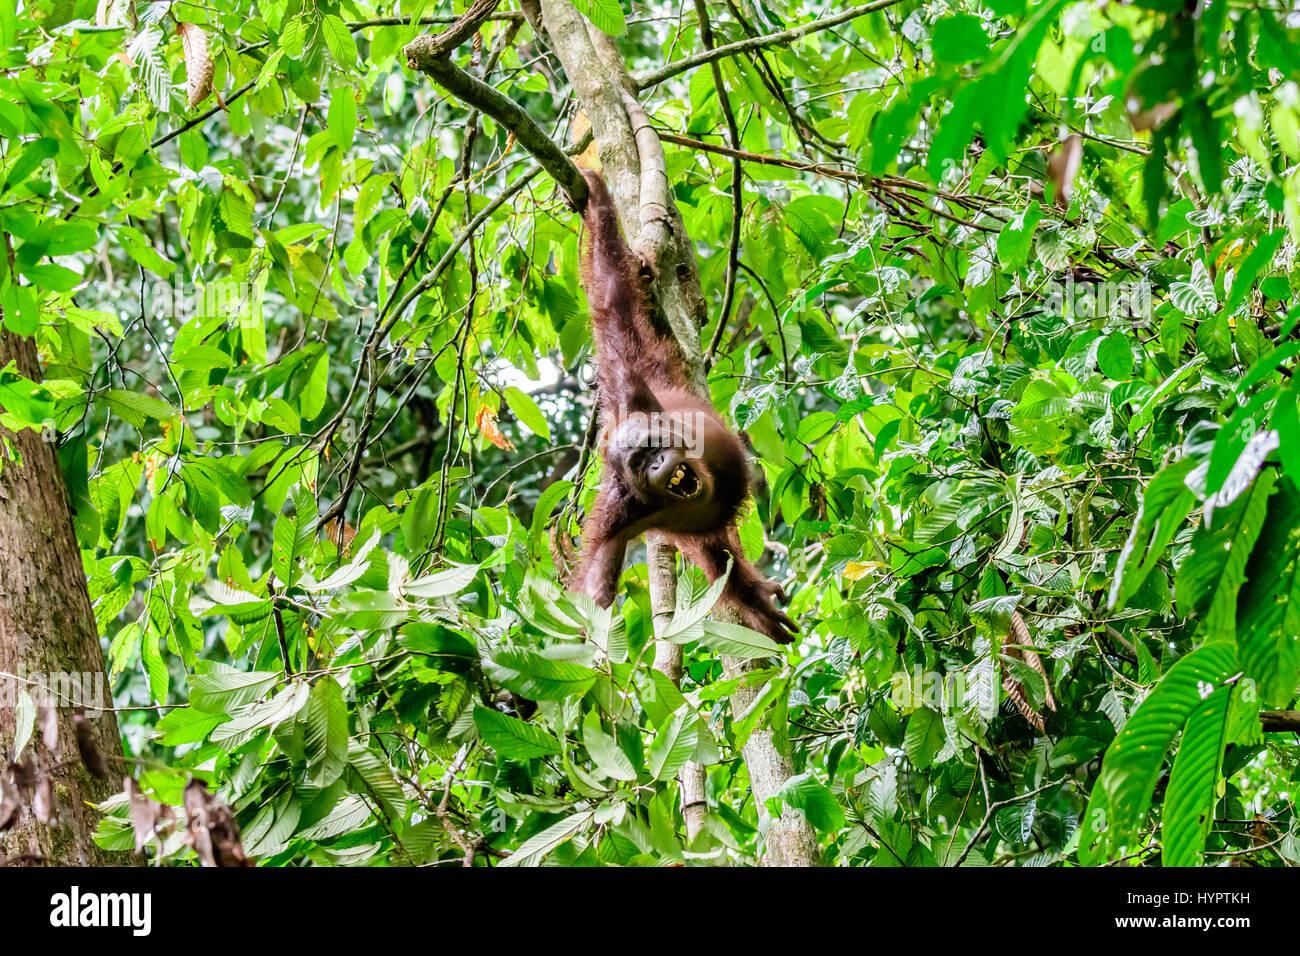 Orangutan in an acrobatic pose in the rainforest - Stock Image